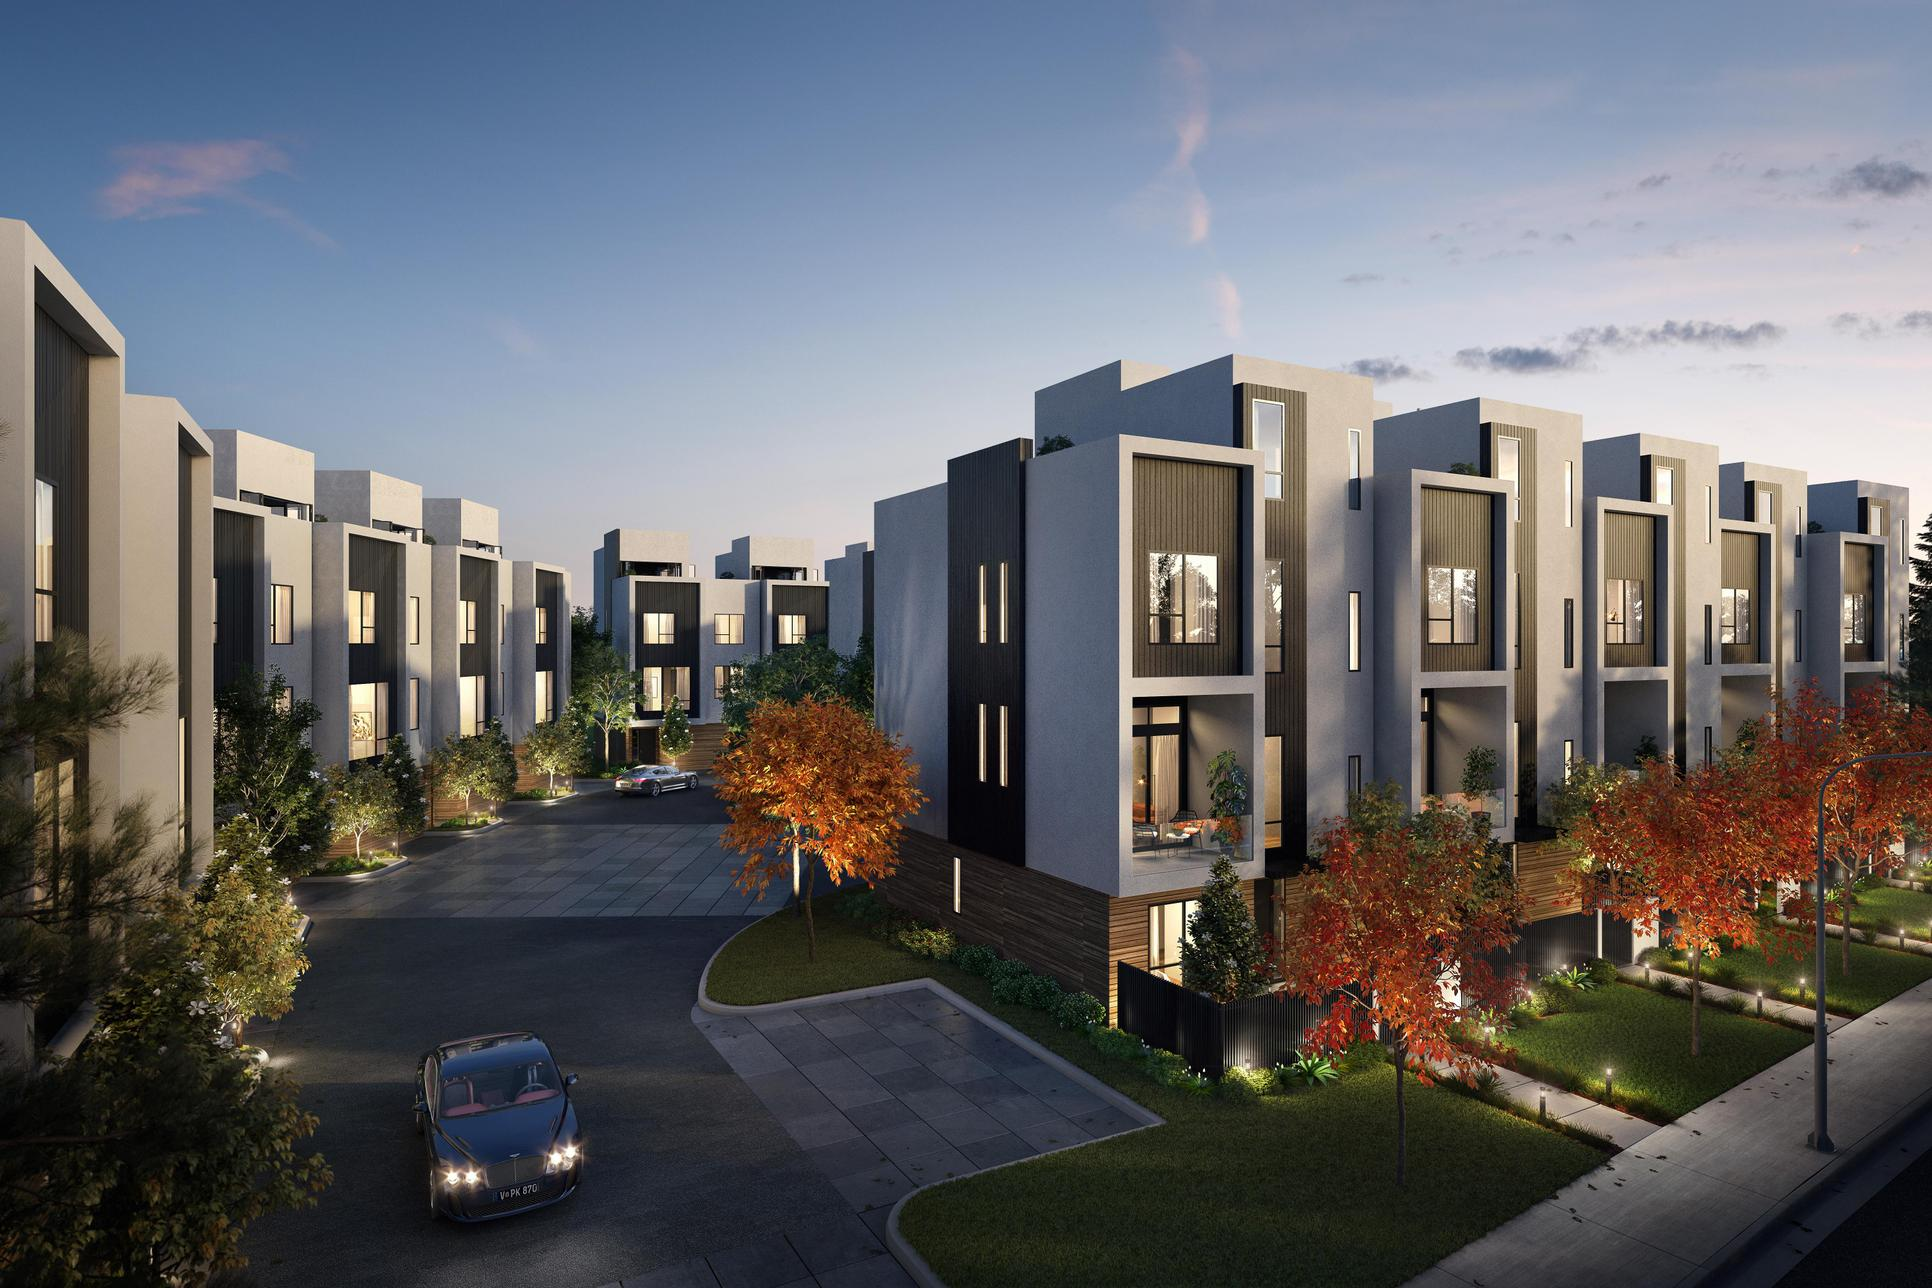 Brentwood Developments